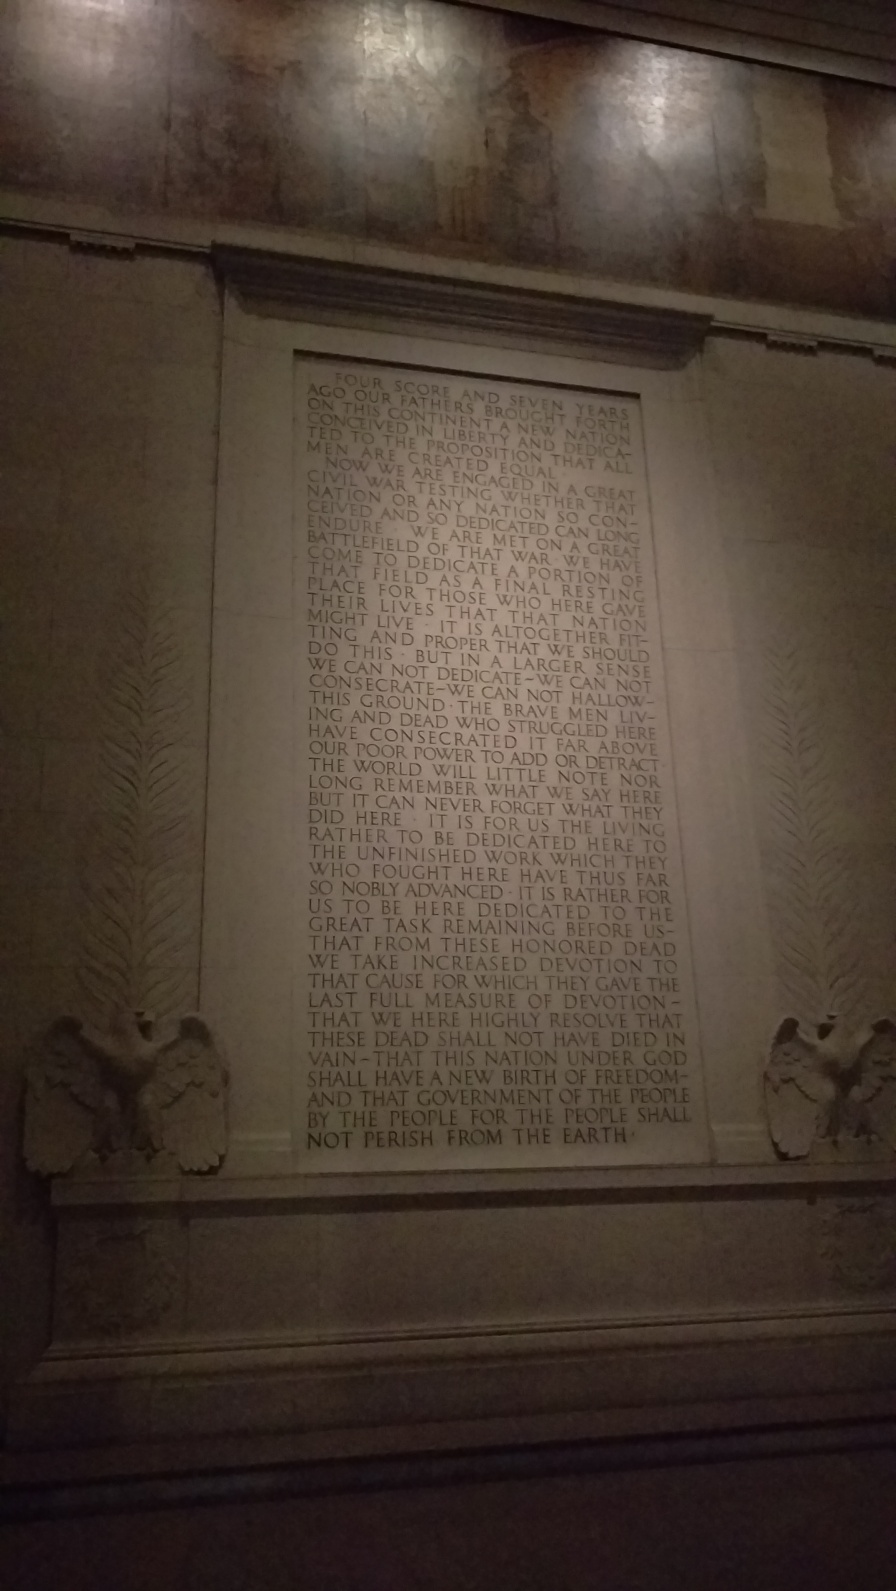 The Gettysburg addressd